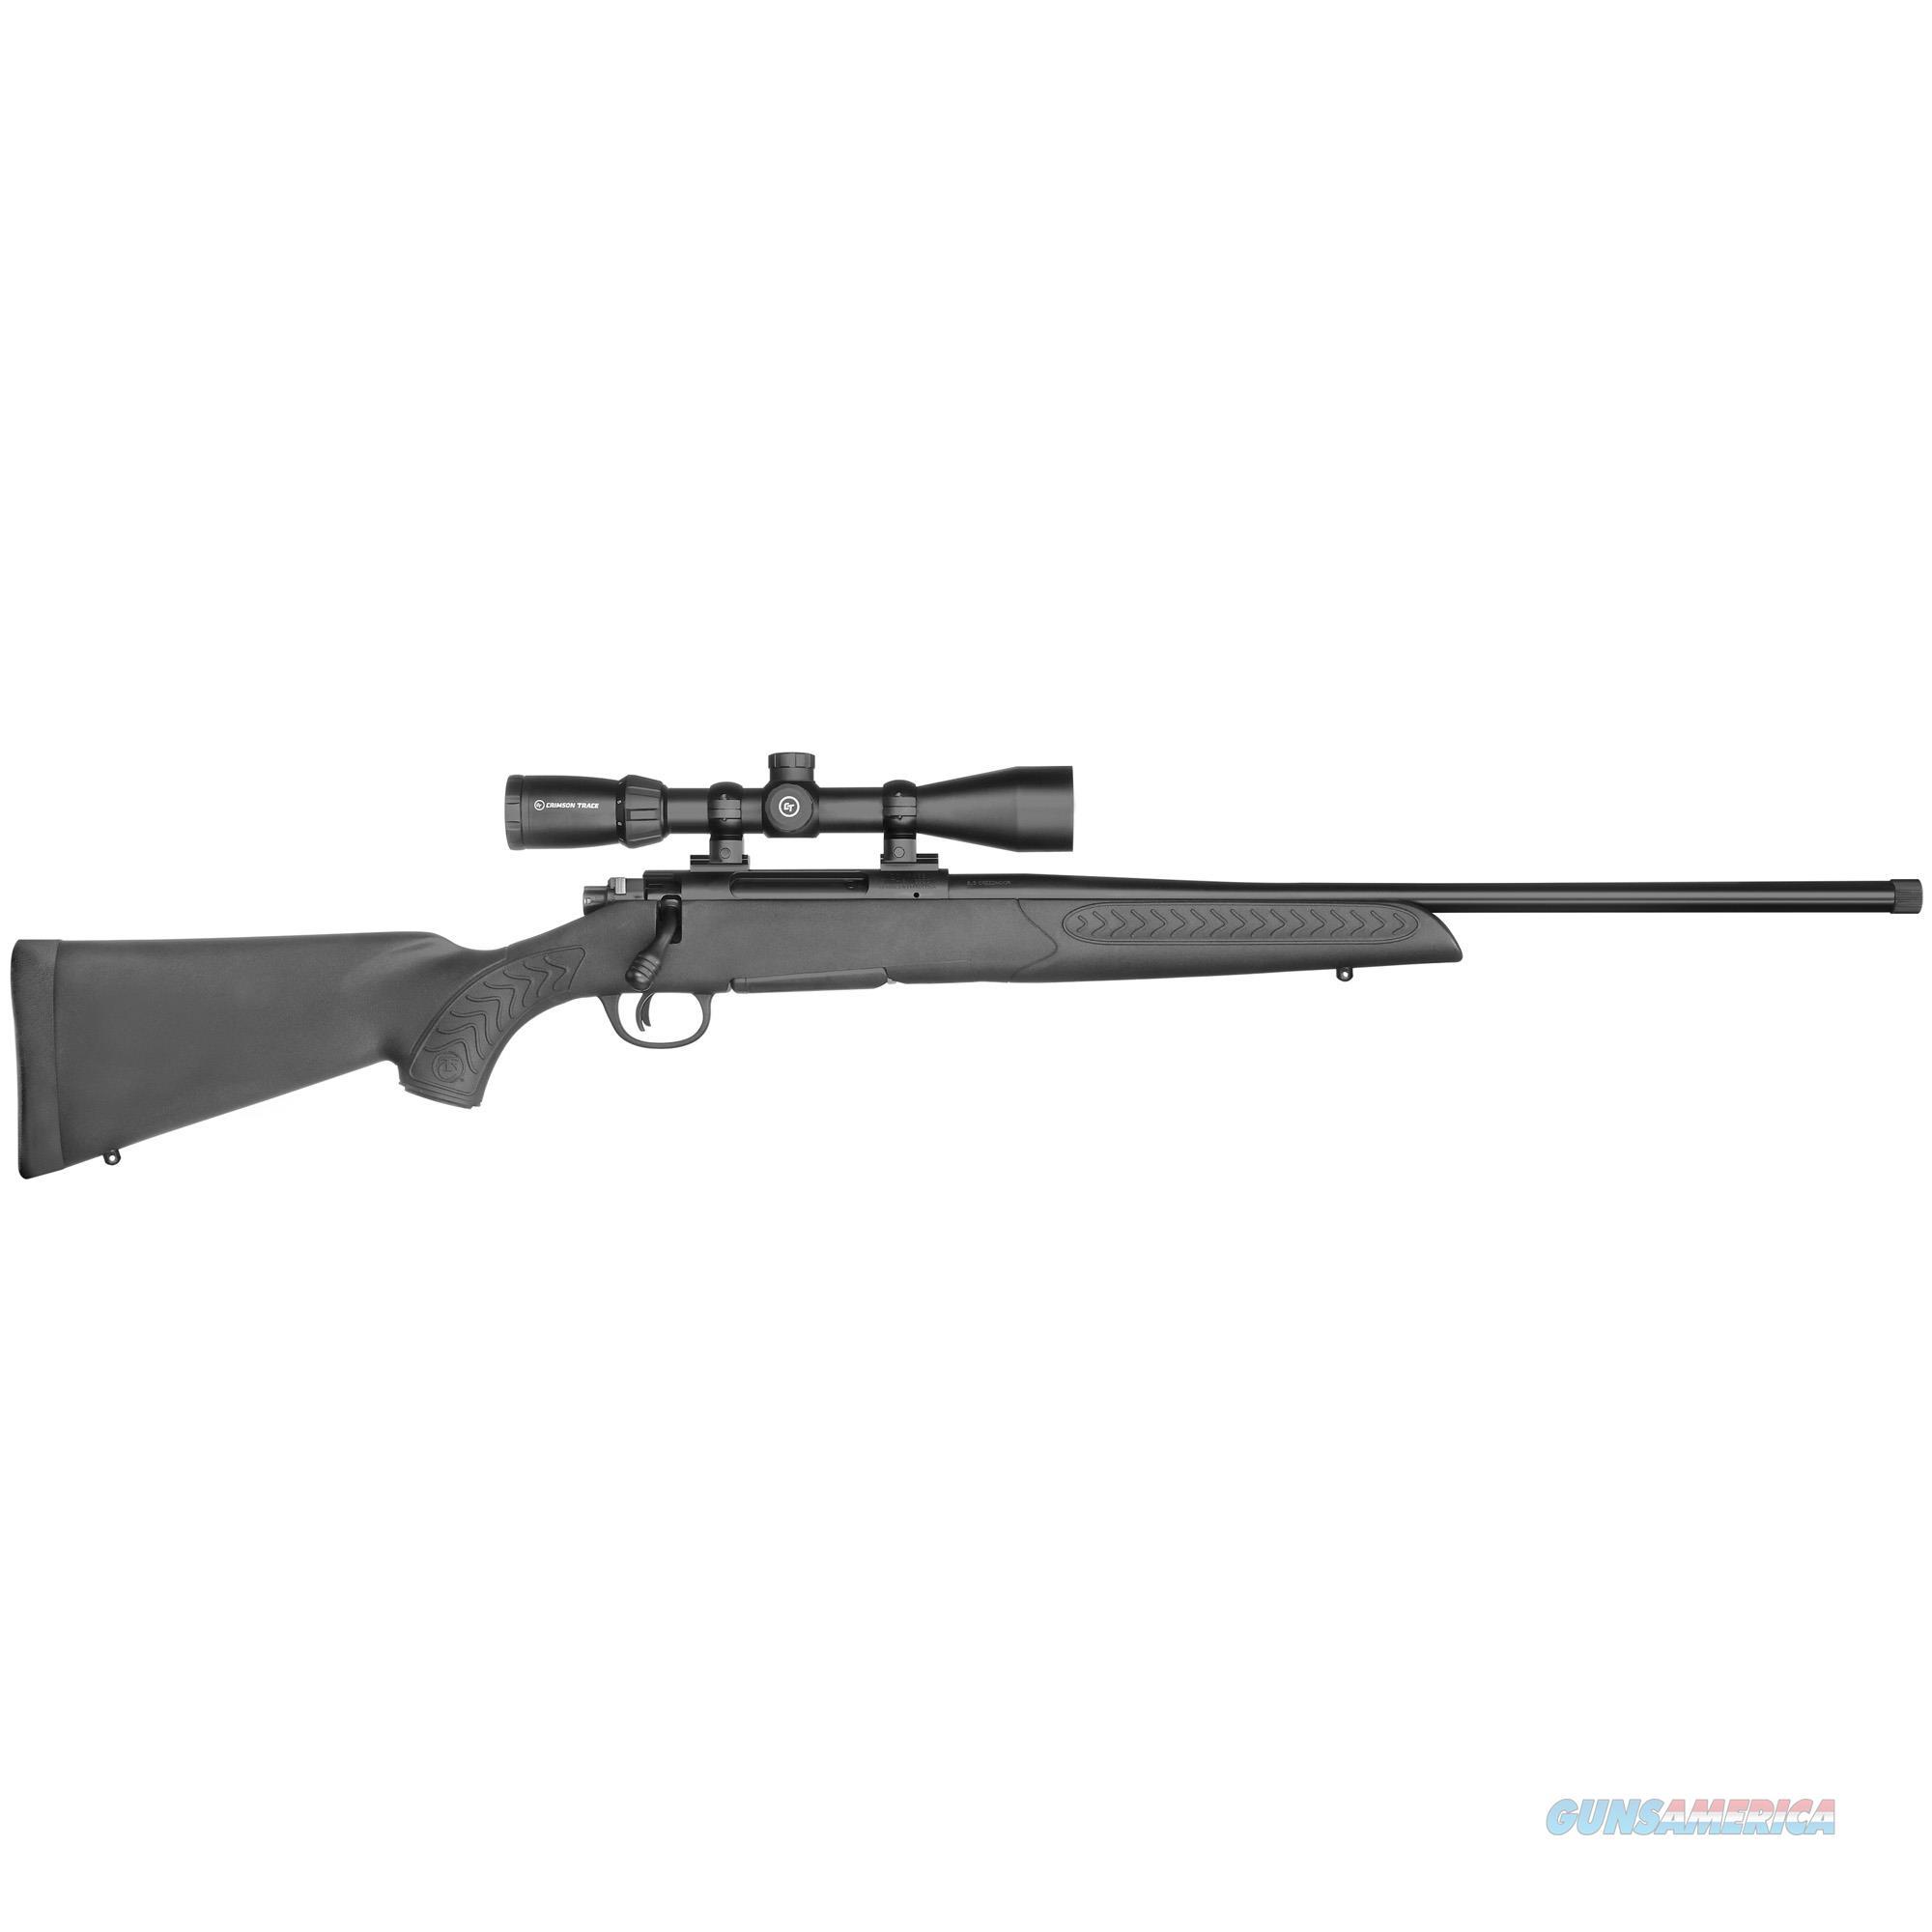 T-c Arms Compass Ii, Tca 13167 Compass Ii 6.5 Creedmoor         W-scope  Guns > Pistols > 1911 Pistol Copies (non-Colt)